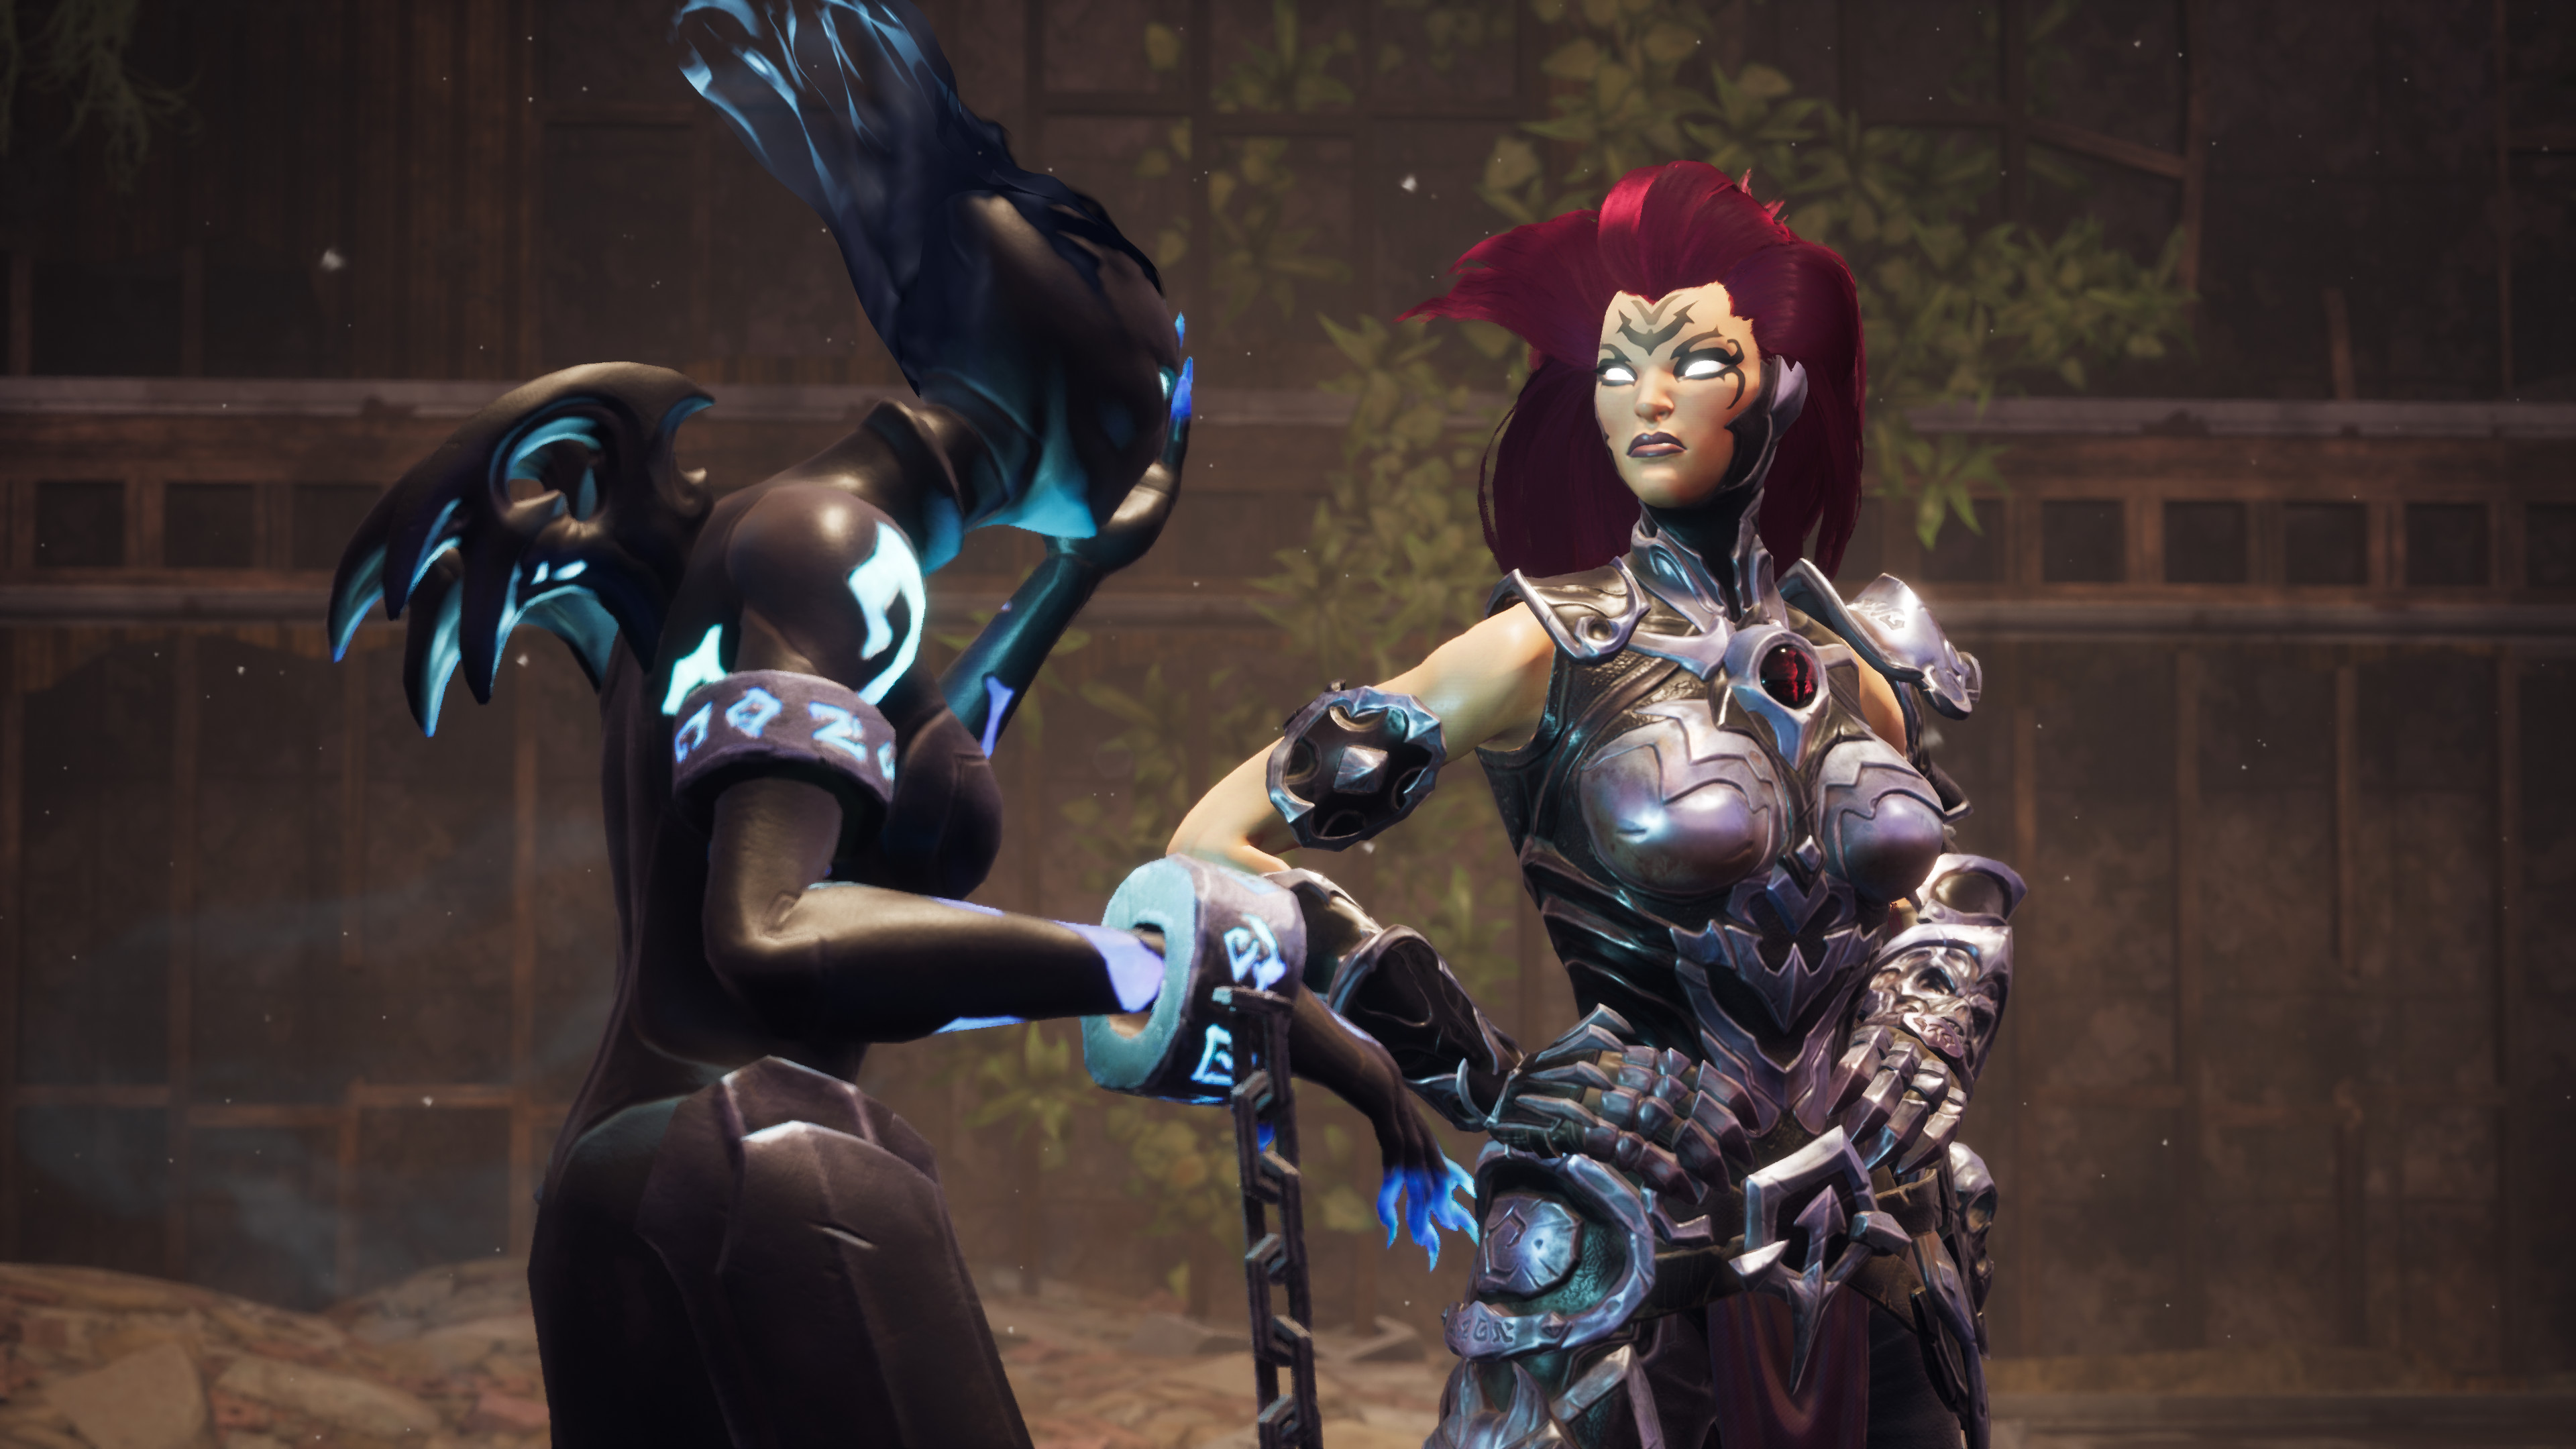 THQ Nordic acquires Darksiders 3 studio Gunfire Games | PC Gamer